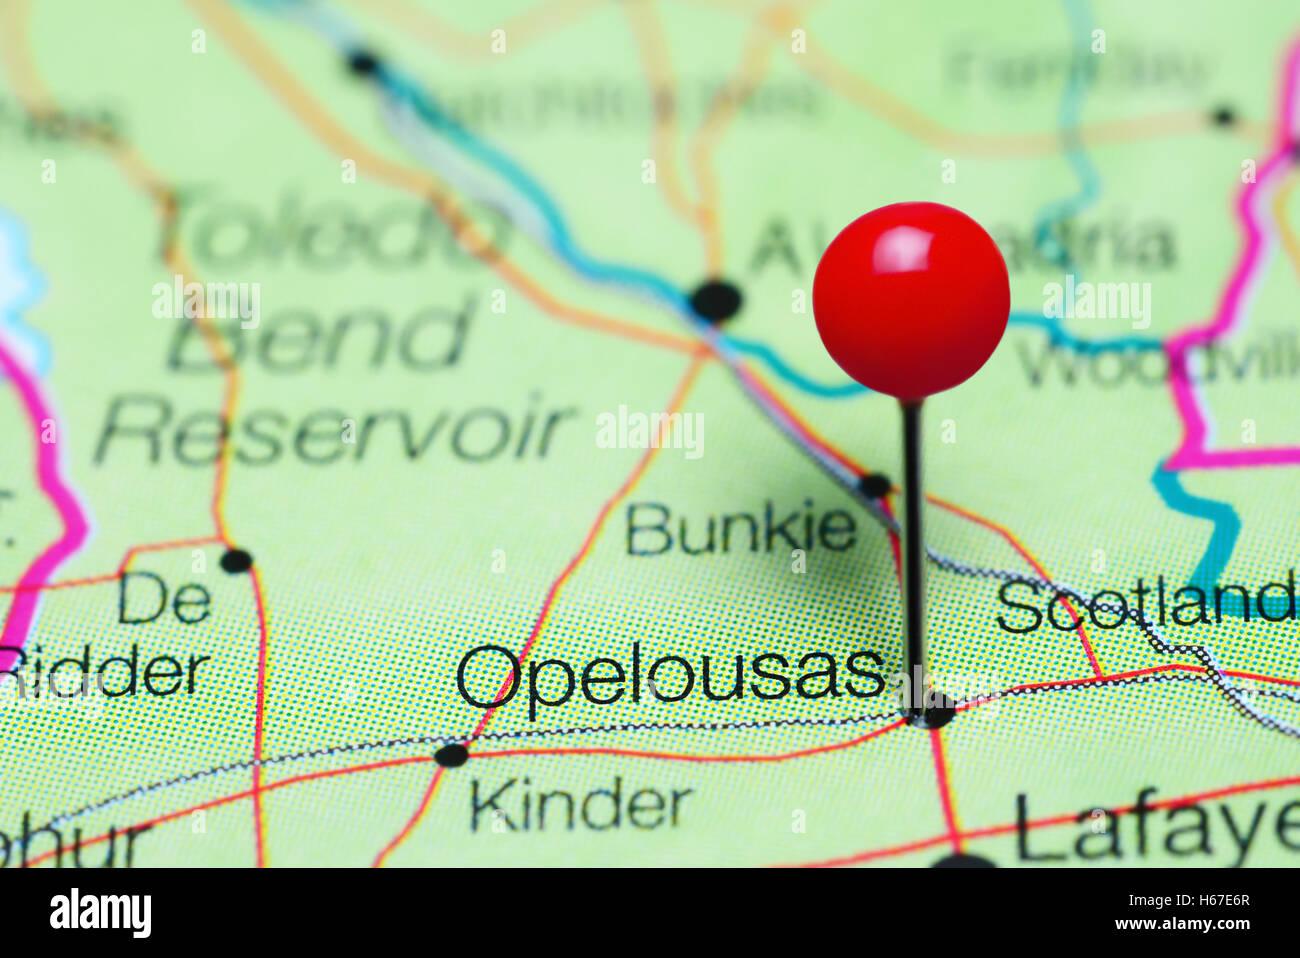 Opelousas Louisiana Map.Opelousas Pinned On A Map Of Louisiana Usa Stock Photo 124325343